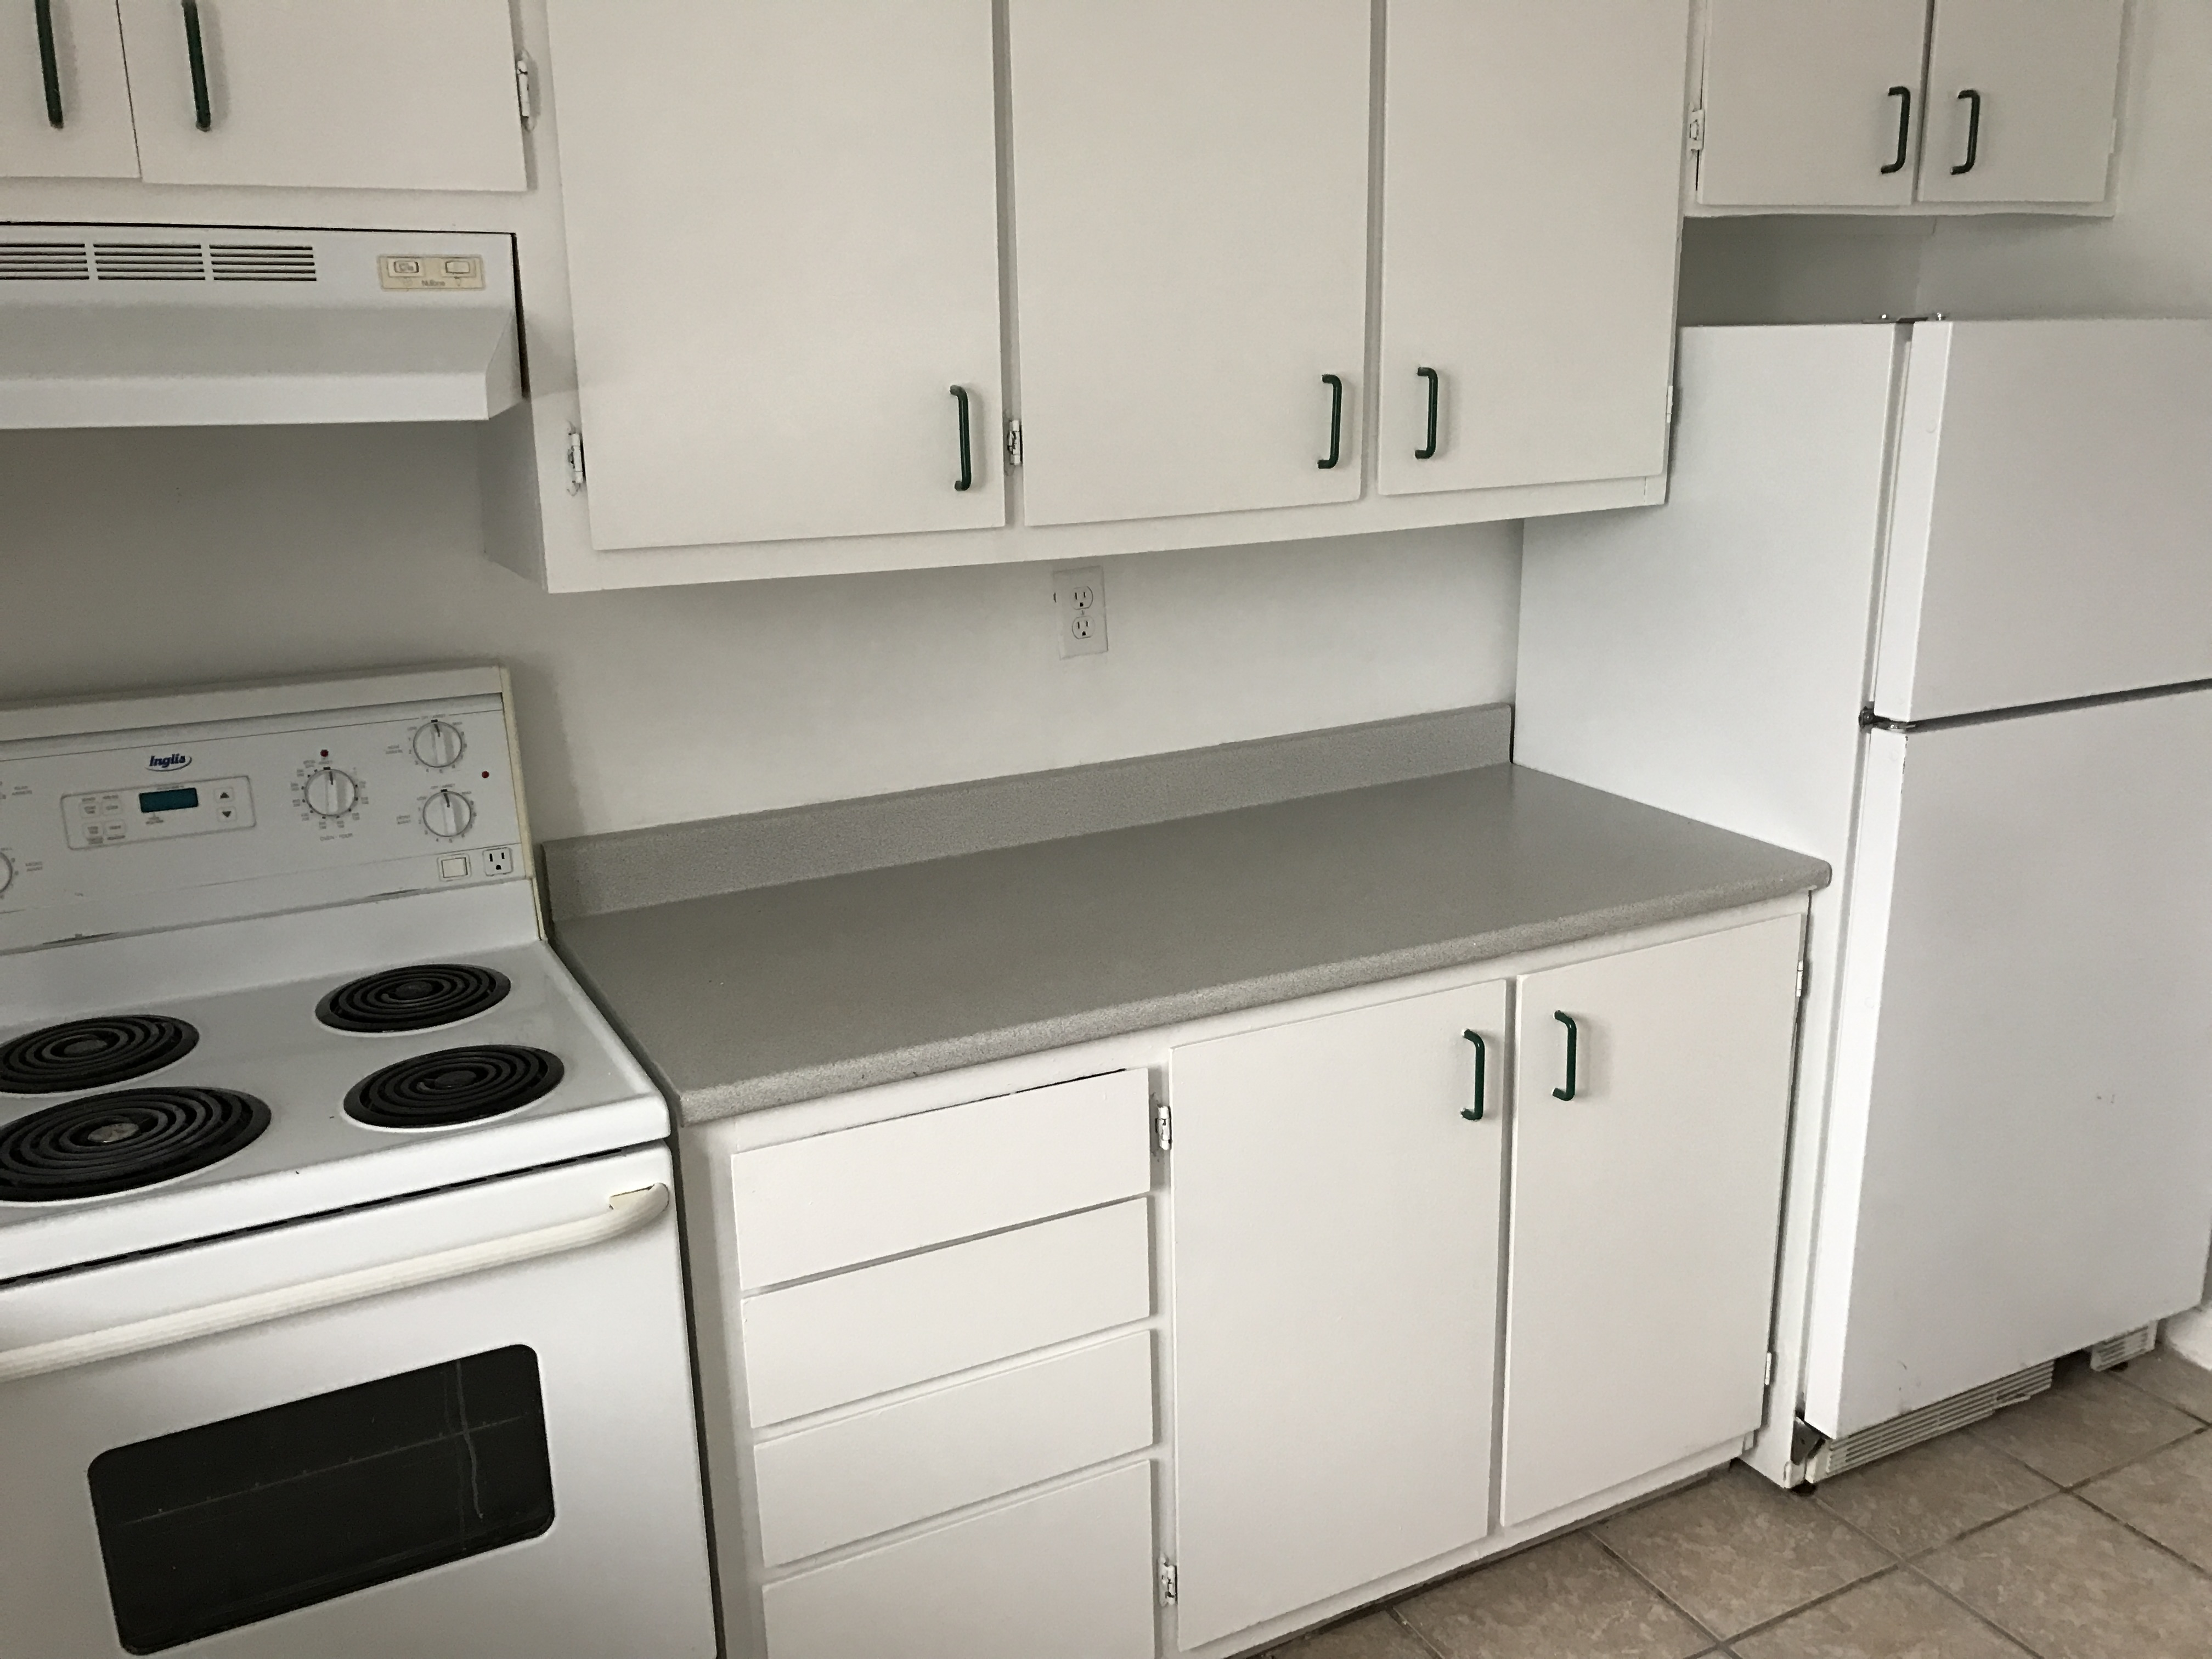 1 bedroom Apartments for rent in Pierrefonds-Roxboro at 16440 Blvd Gouin - Photo 07 - RentQuebecApartments – L403873